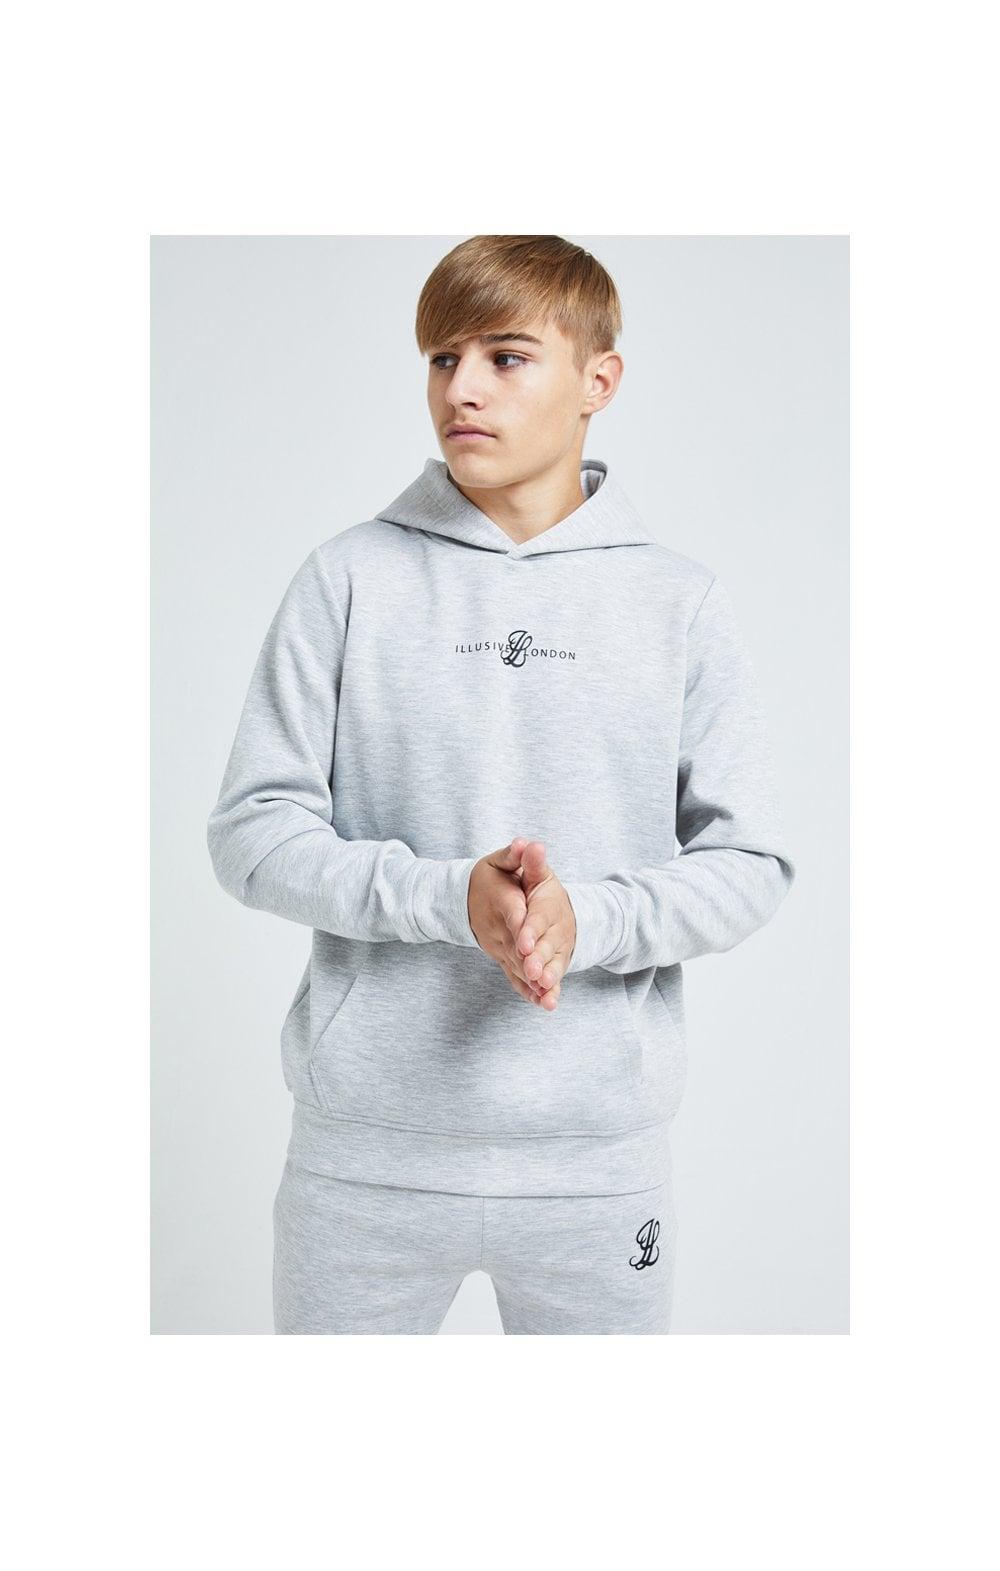 Illusive London Dual Overhead Hoodie - Grey Kids Top Sizes: 9-10 YRS